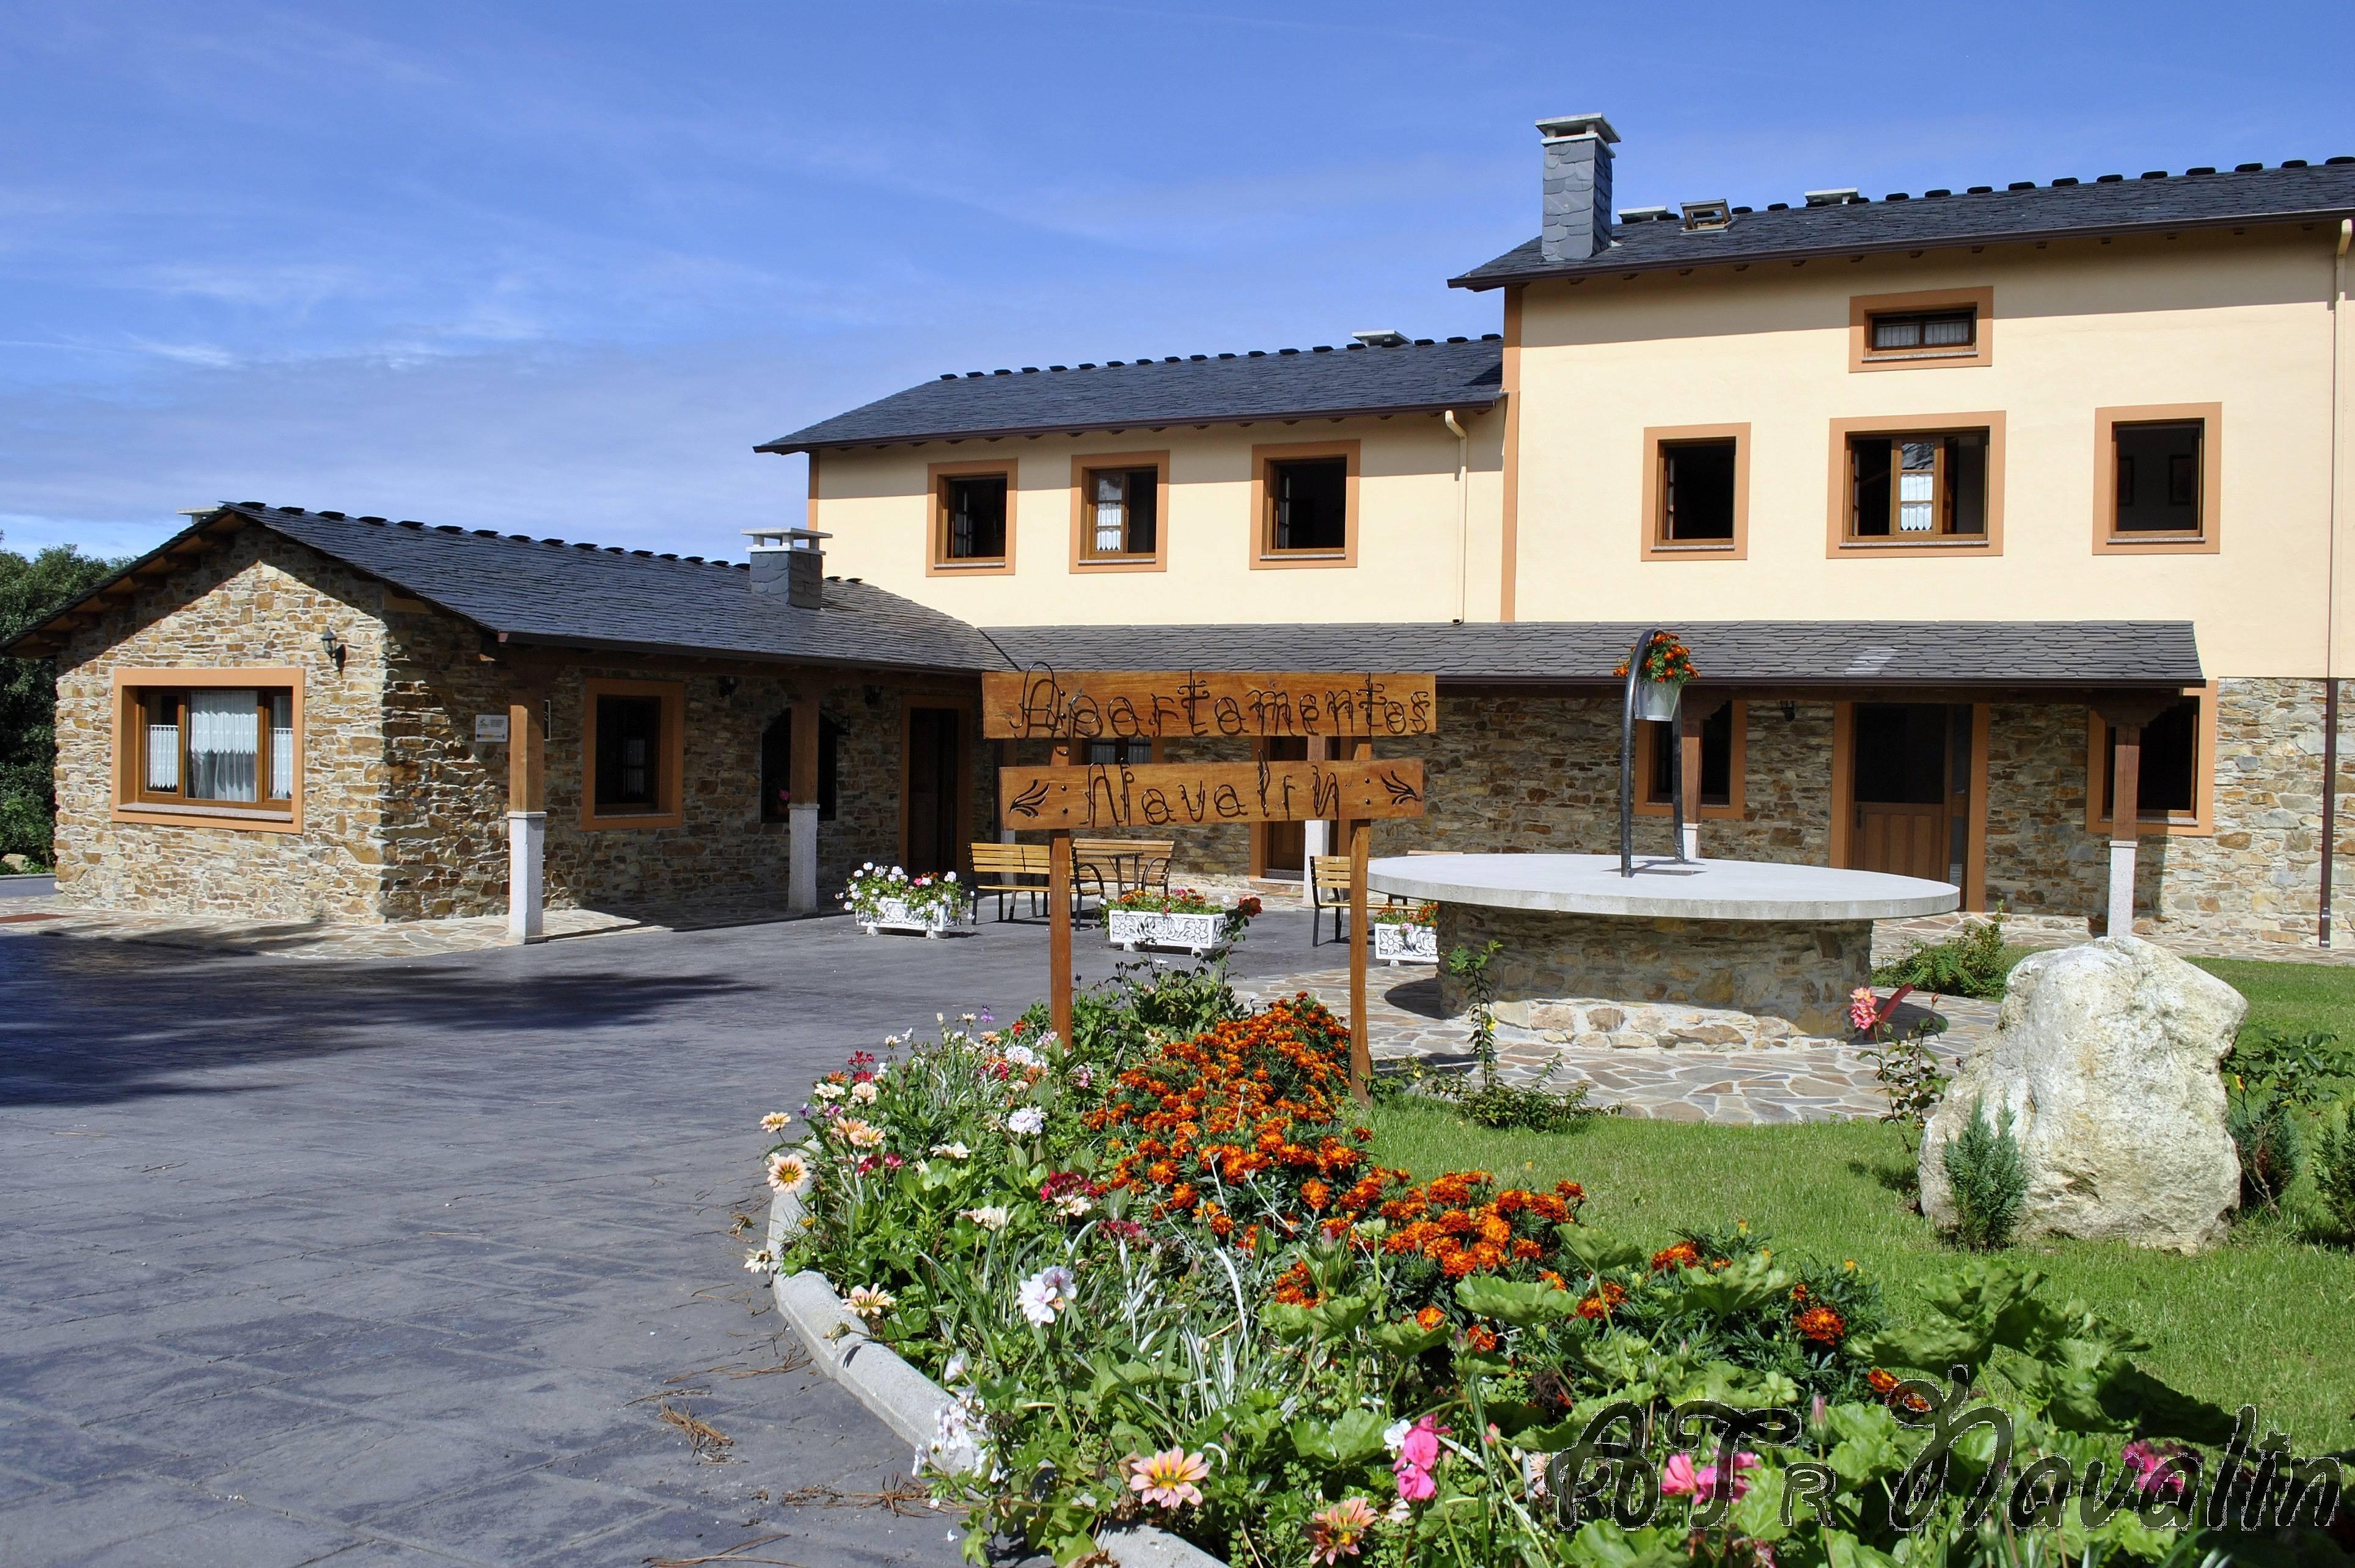 Apartamentos navalin serantes tapia de casariego asturias - Apartamentos baratos asturias ...